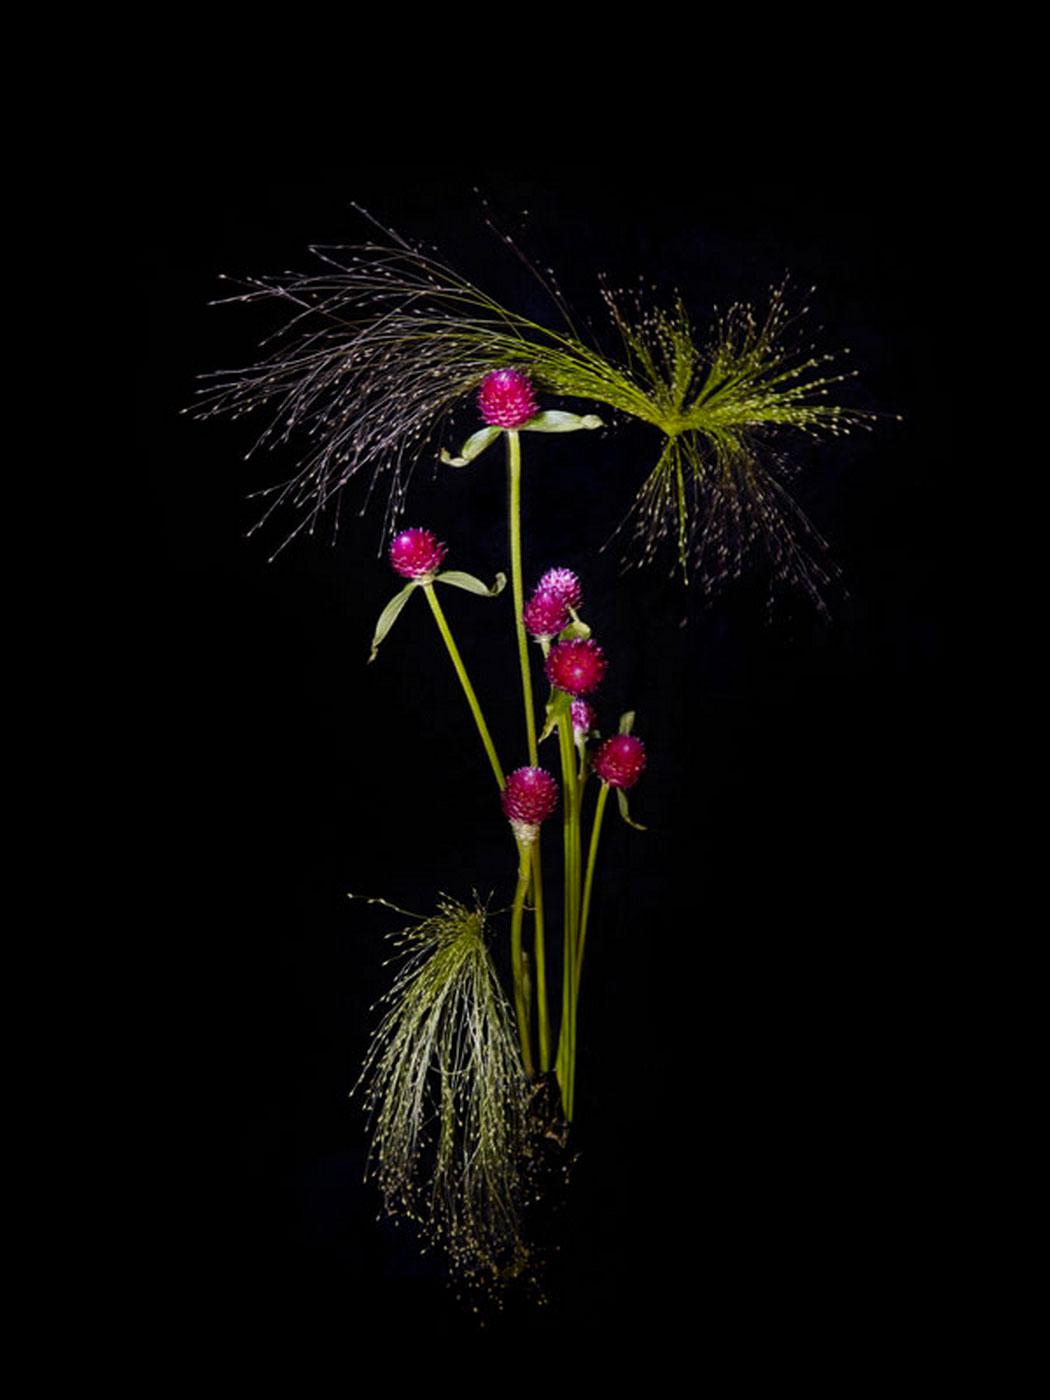 sarah-illenberger-flowerwork-08.jpg